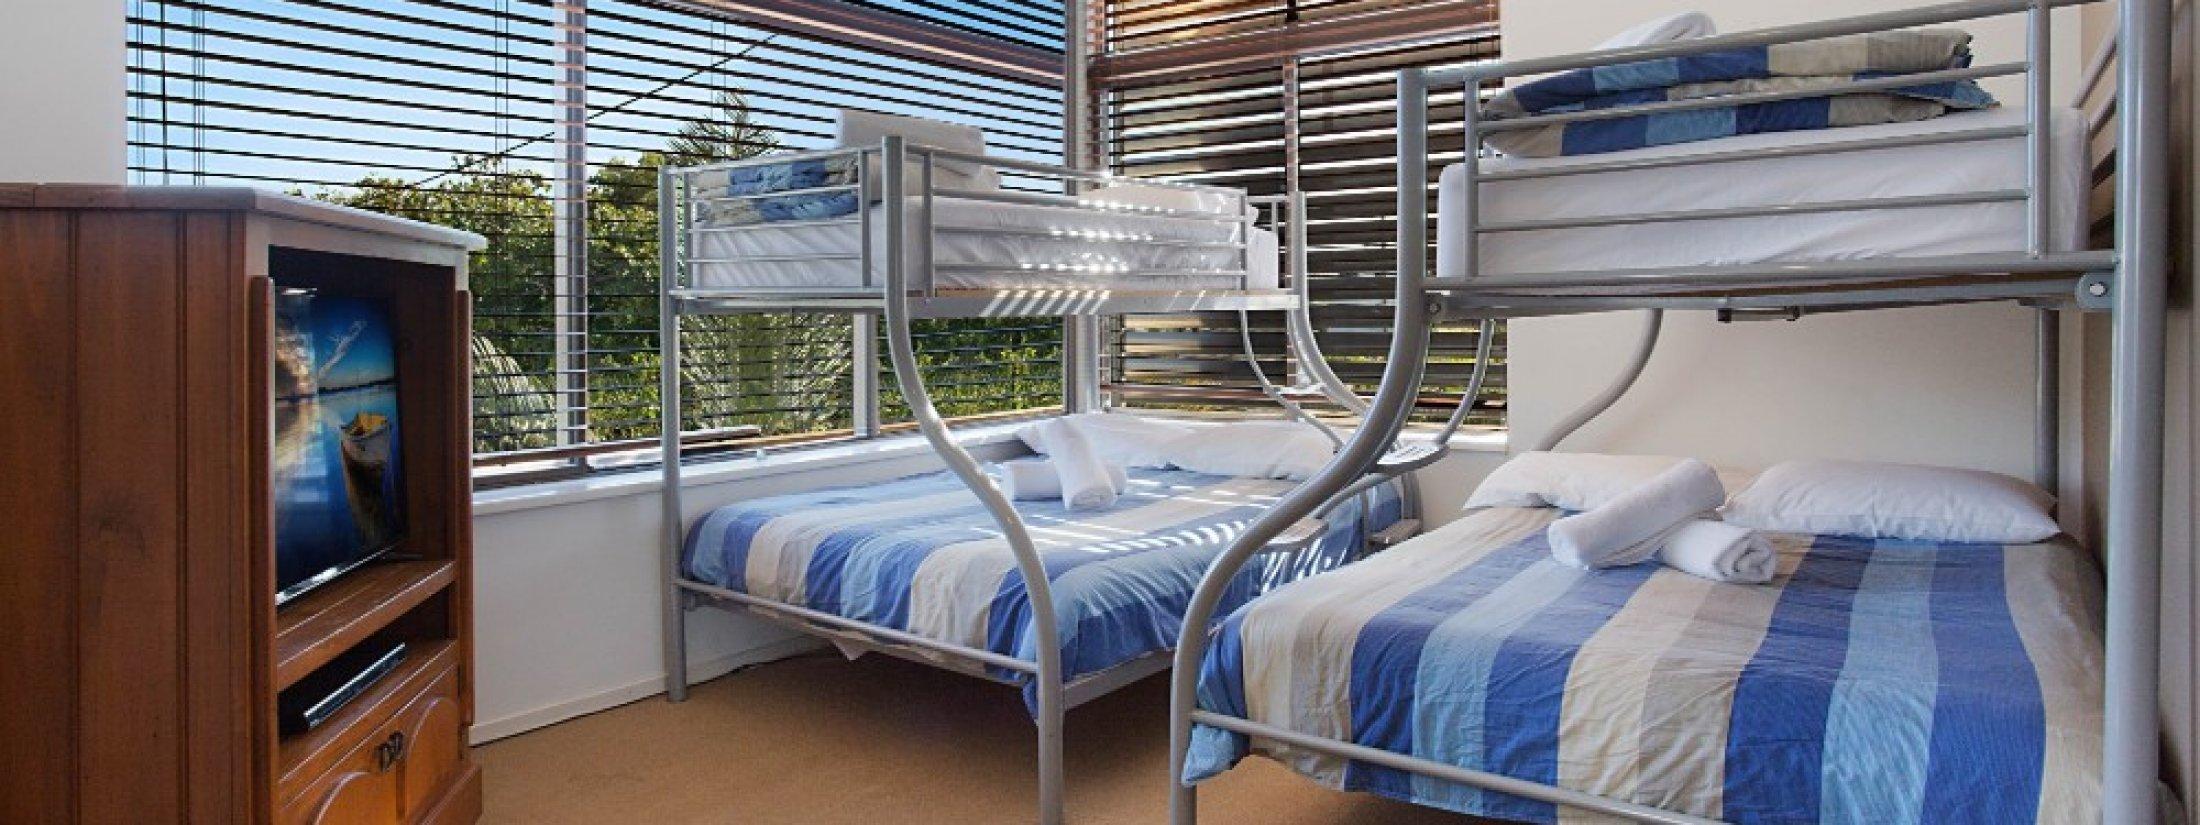 Chevron Oasis - Gold Coast - Bunk Bedroom